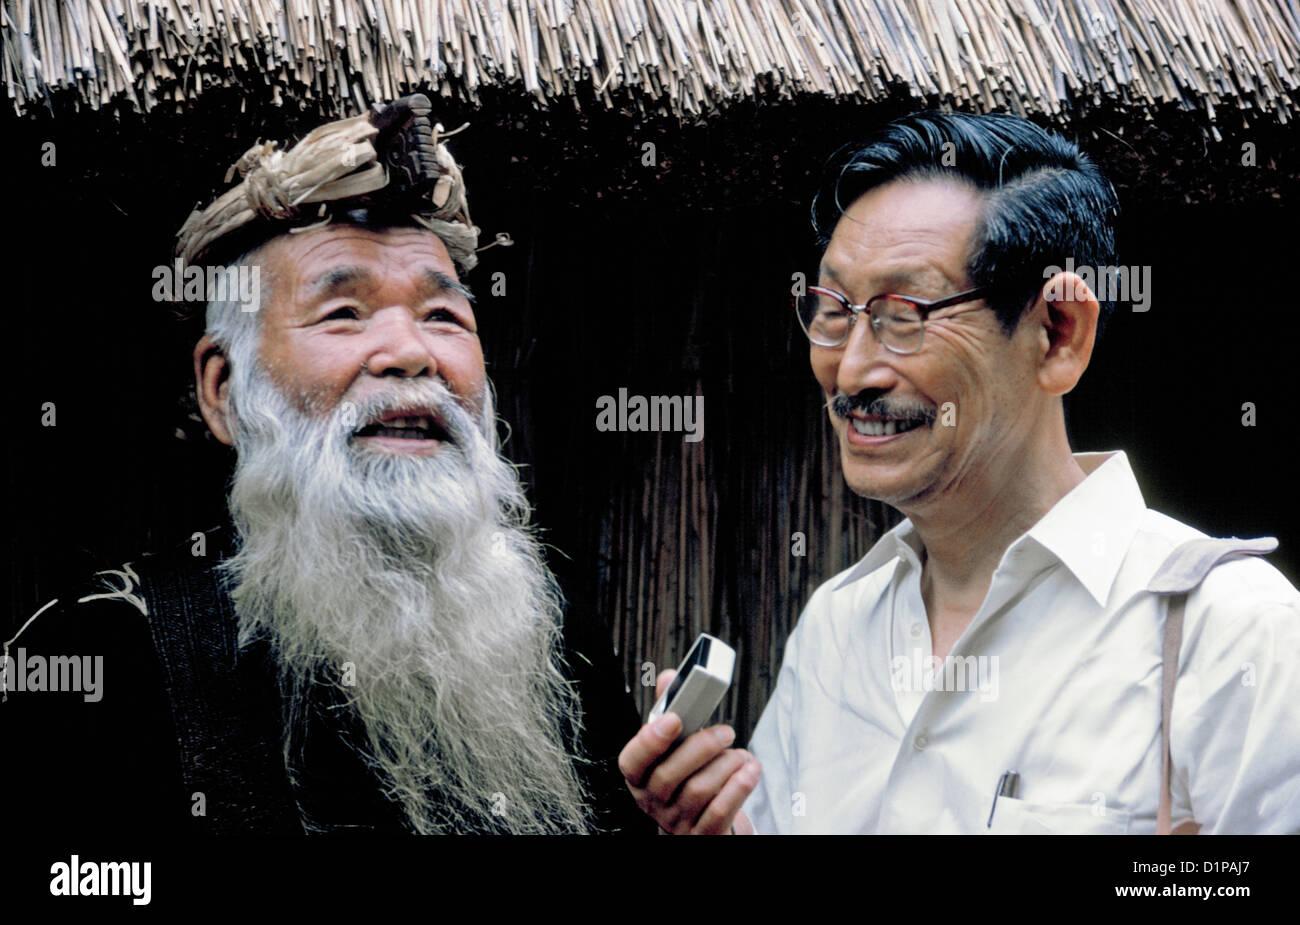 Japanese linguist Prof. Kyosuke Kindaichi tape records the stories of a bearded Ainu village chief in Hokkaido, - Stock Image